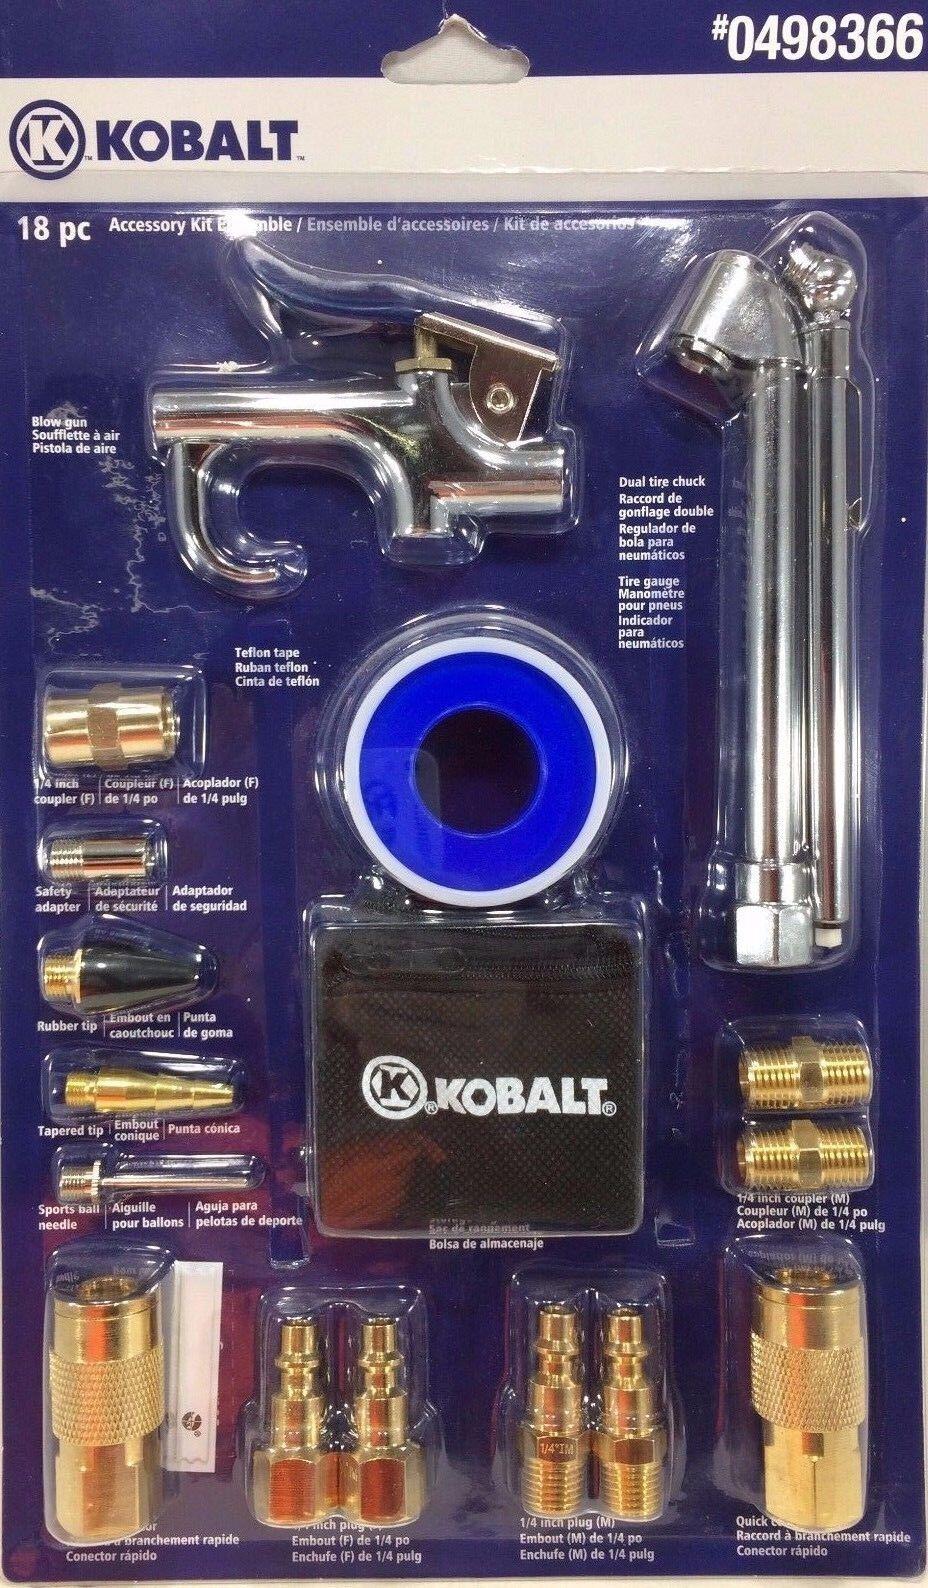 Kobalt 18-piece Air Compressor Accessory Kit Ensemble